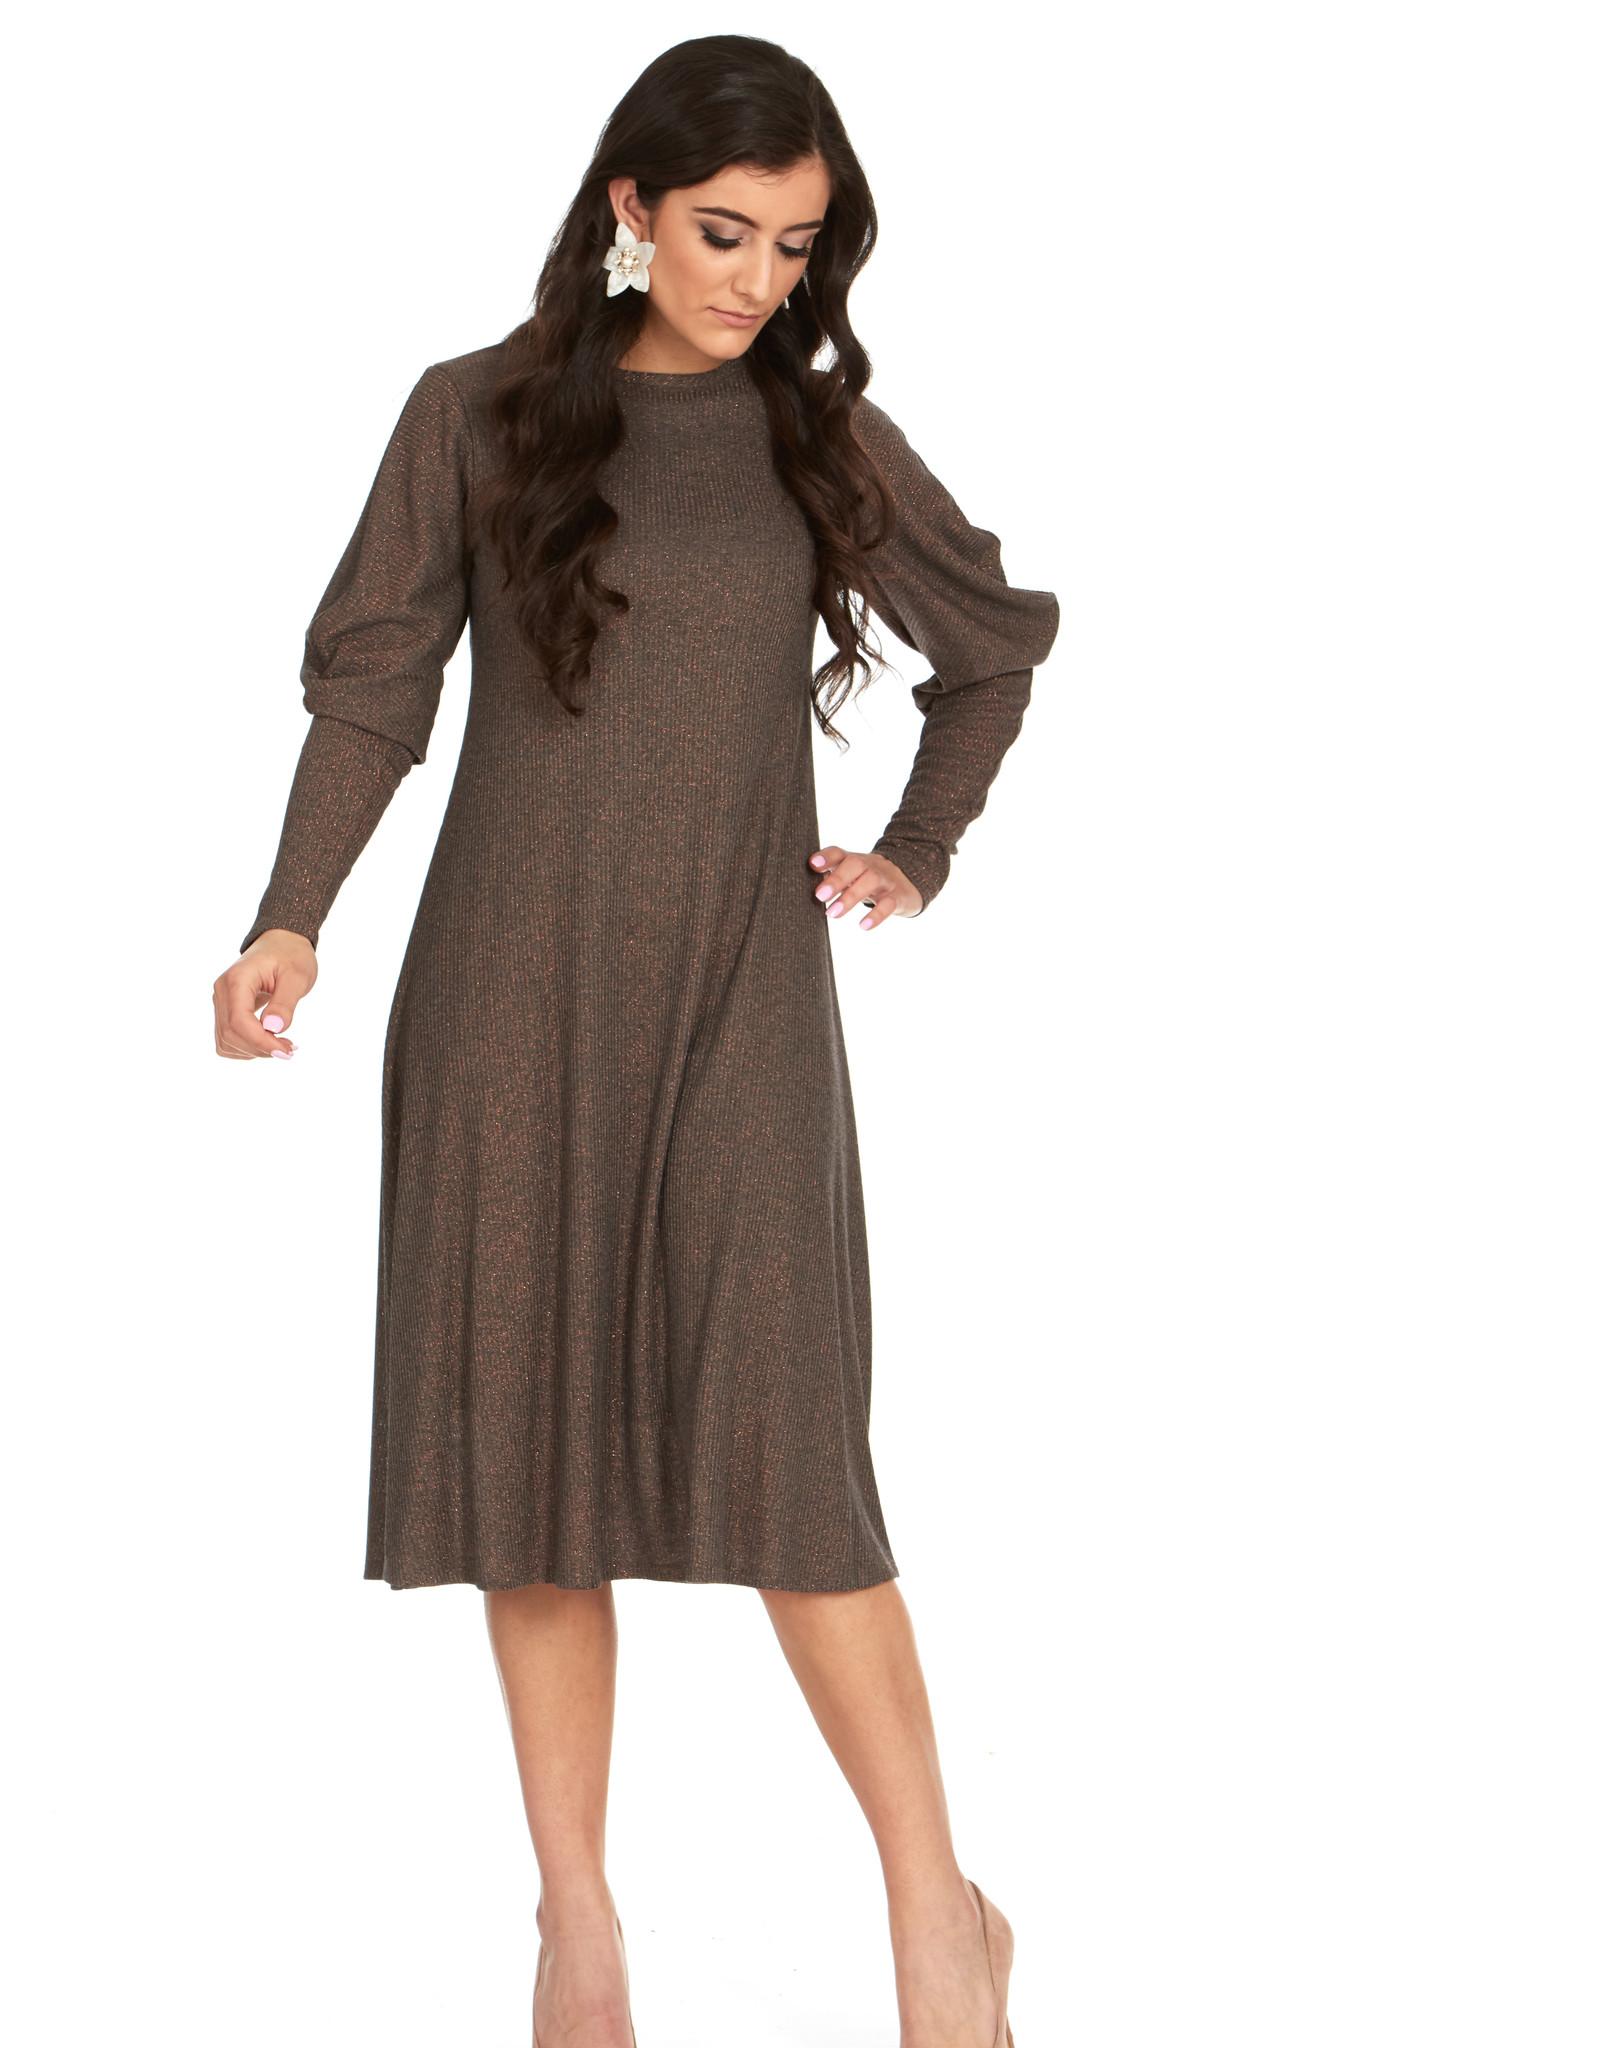 Bella Donna Bella Donna Draped Sleeve Dress with Lurex